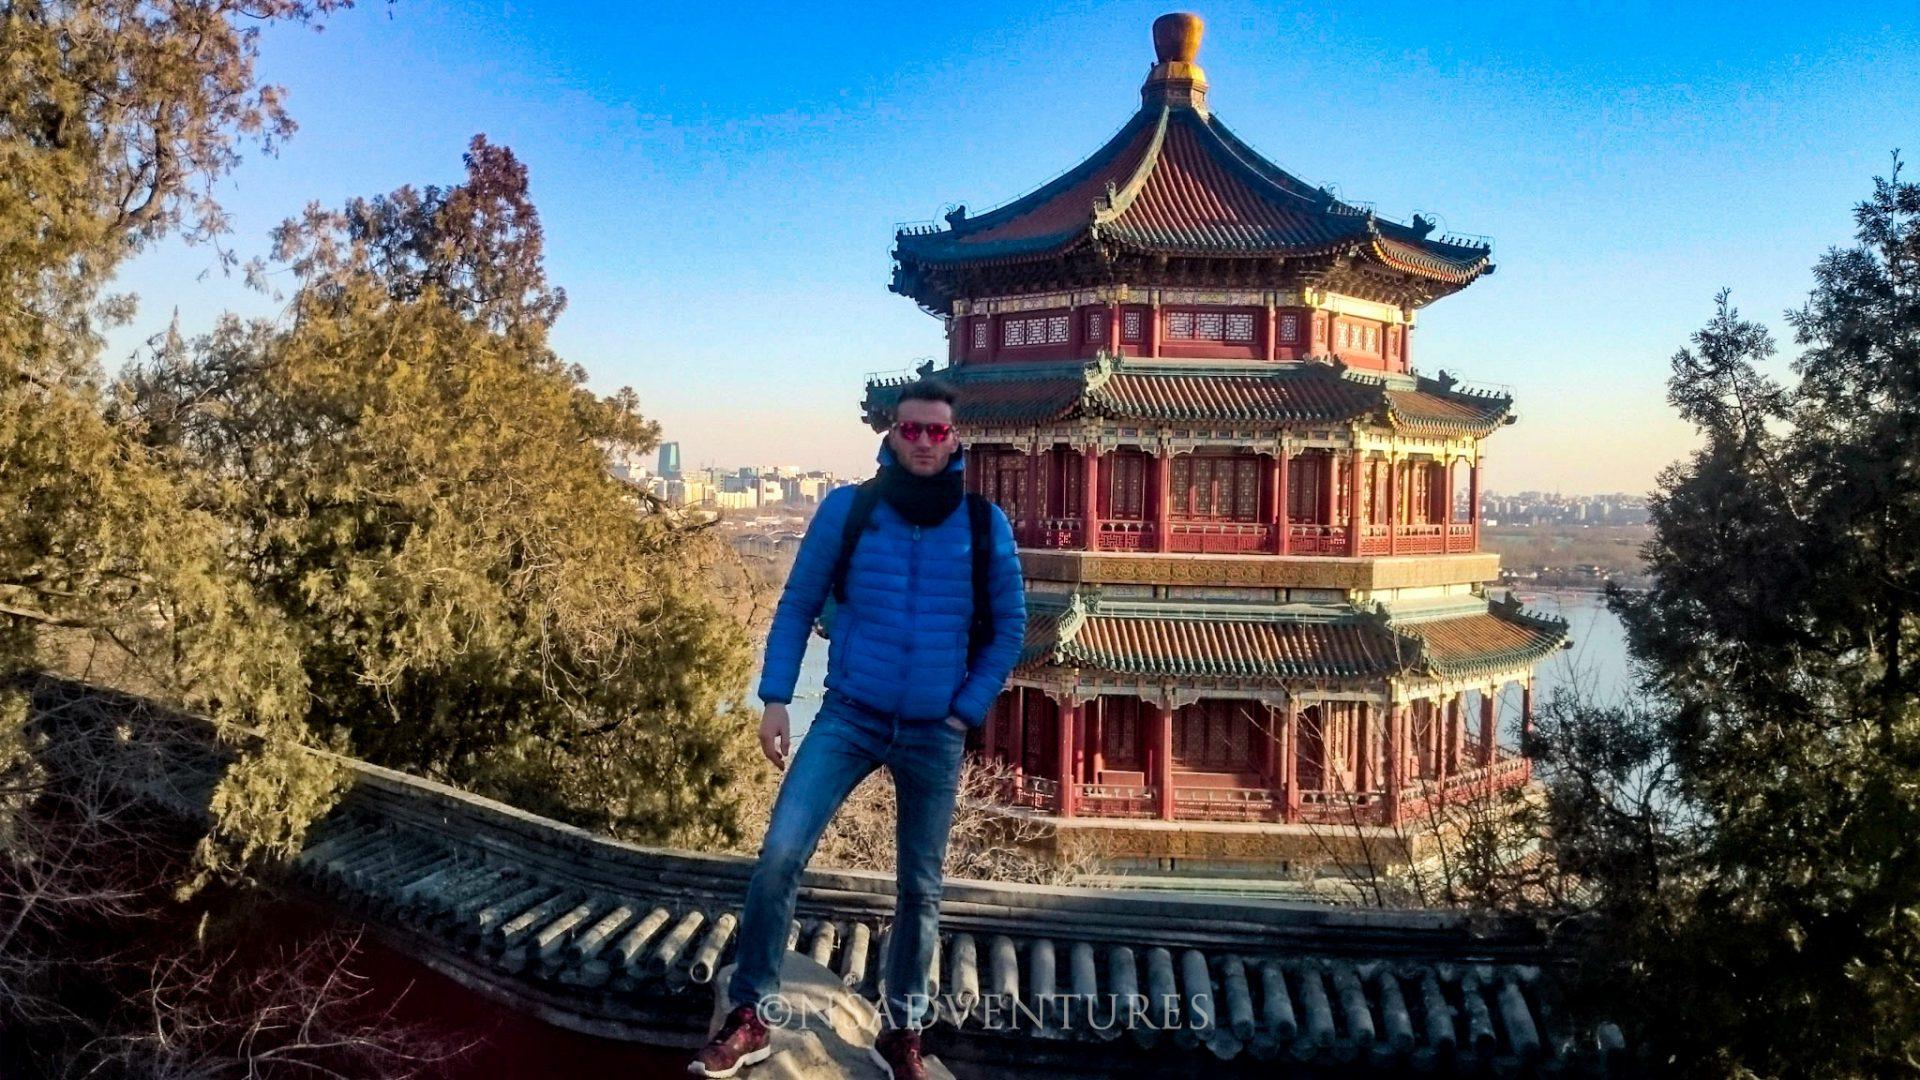 Itinerario viaggio su misura: China, Beijing, Summer Palace